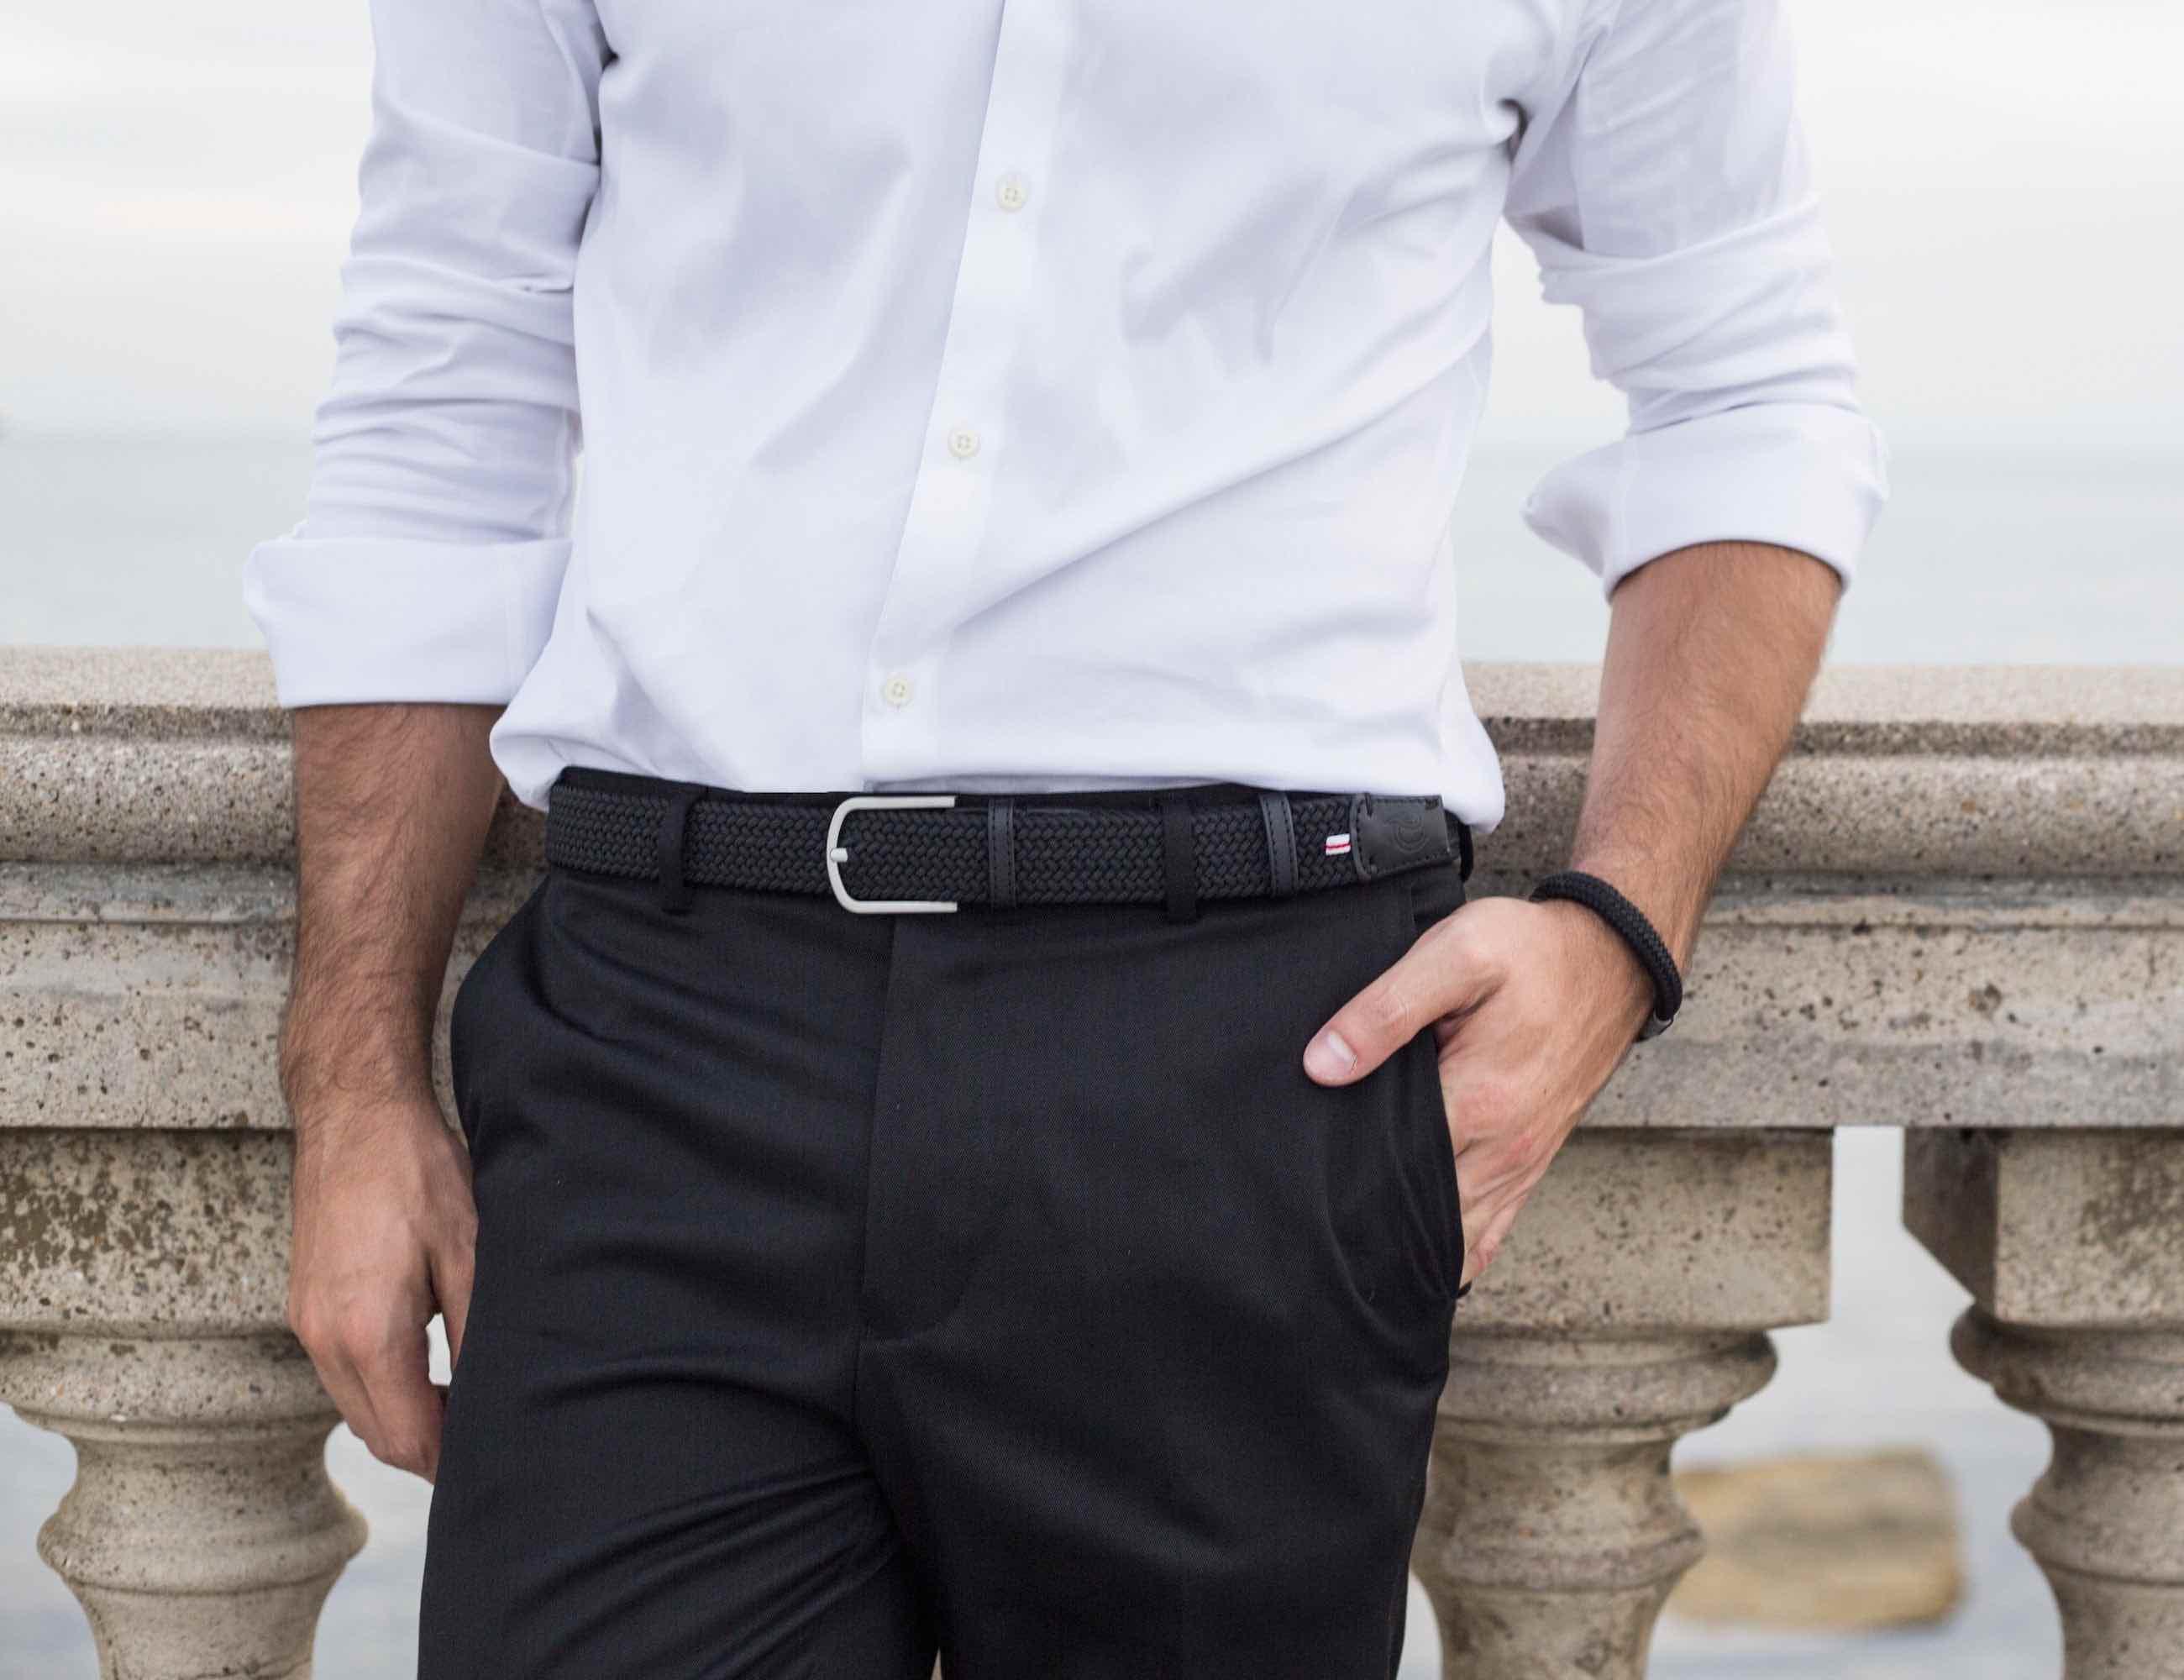 La Boucle Fully Adjustable Belt